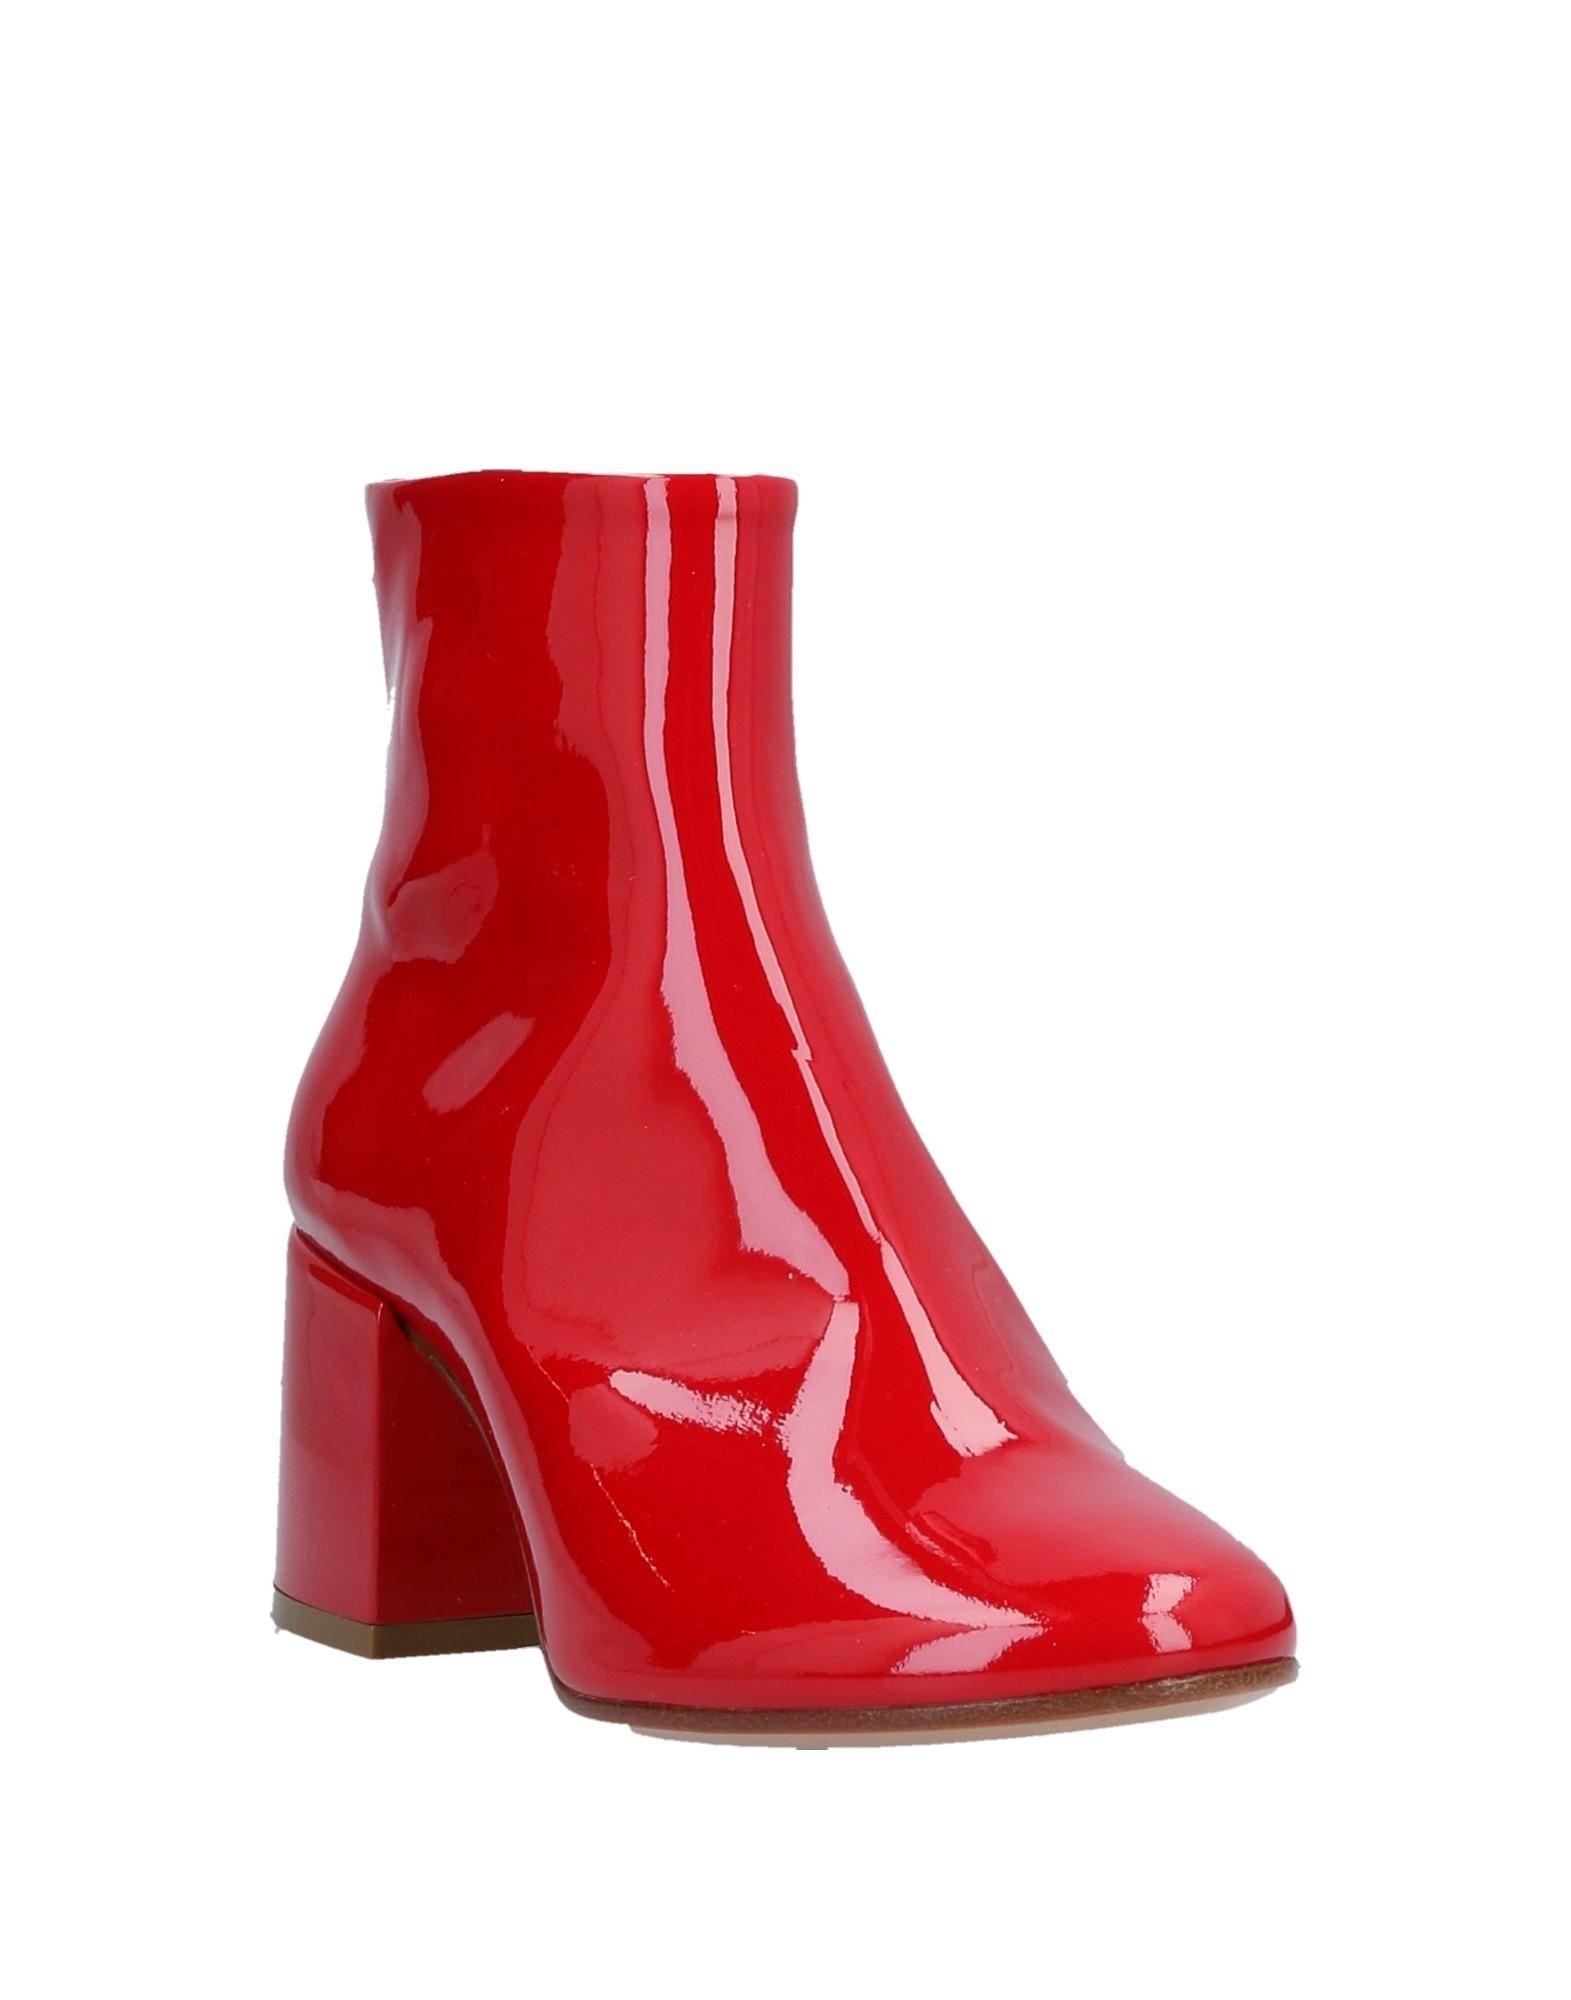 Rabatt Schuhe Stiefelette Mm6 Maison Margiela Stiefelette Schuhe Damen  11566676AS 5e79b7